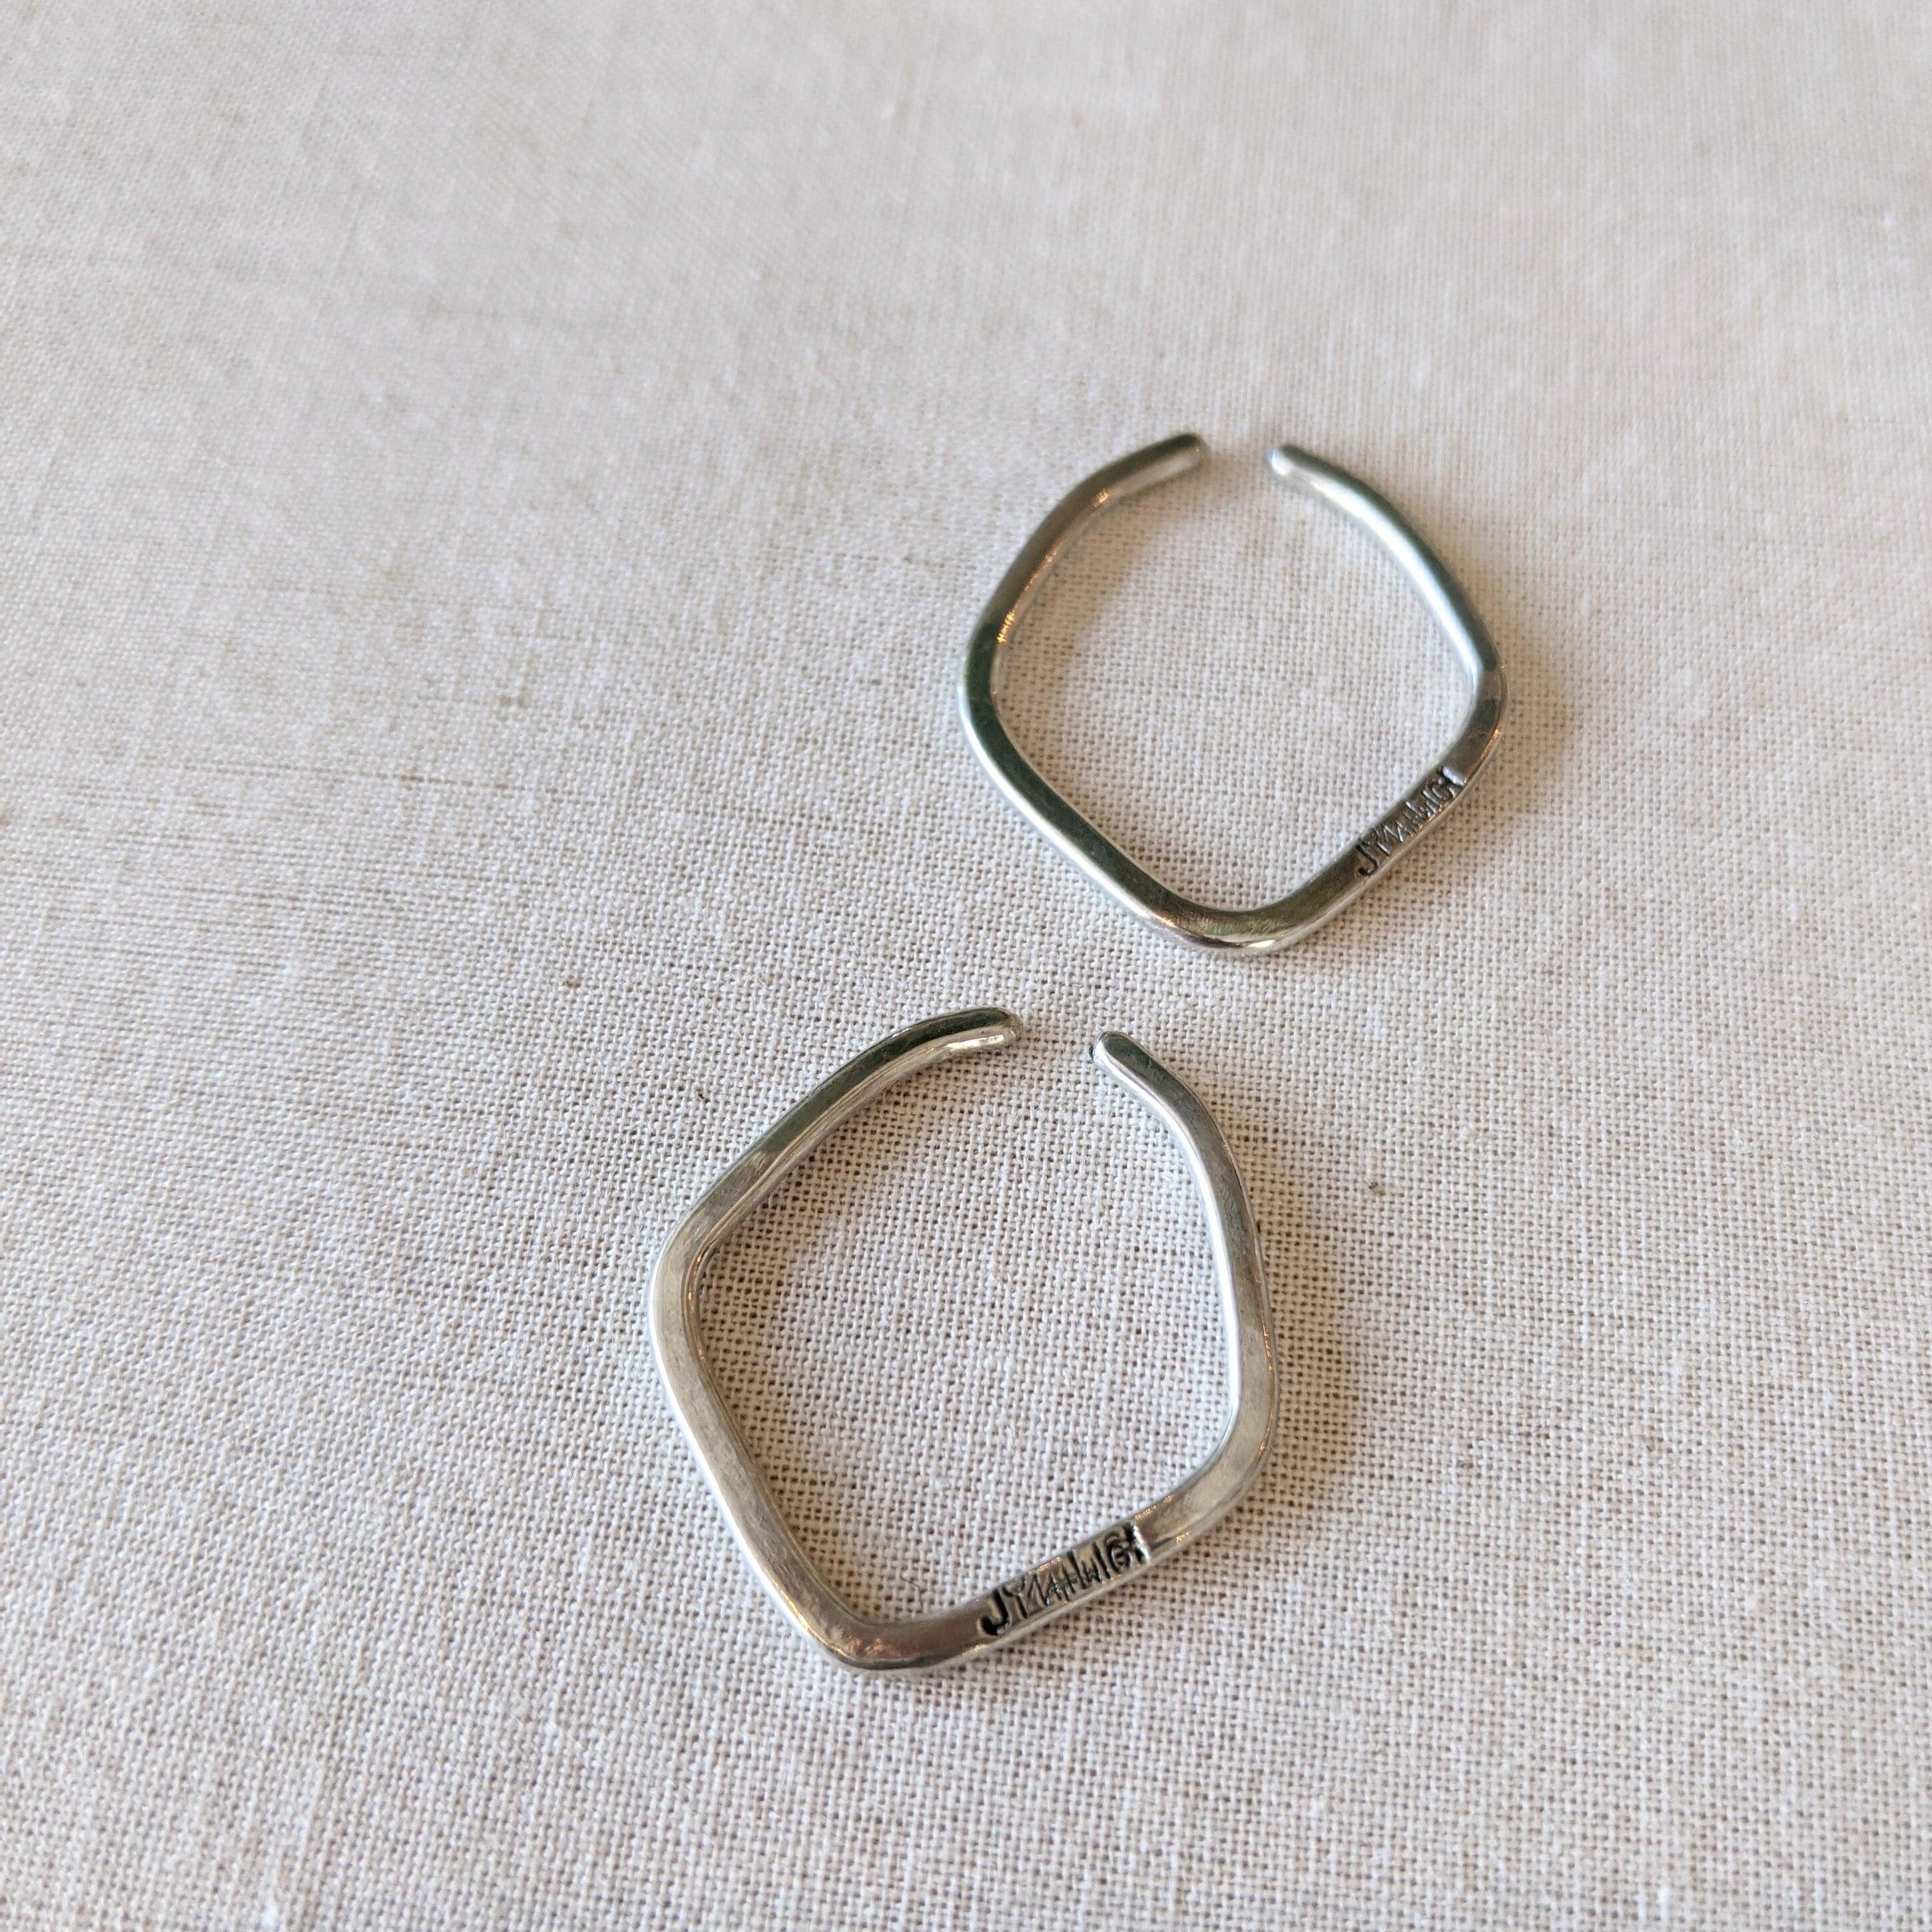 【 jomathwich 】silver earcuff  / 2本set item /  E-2  シルバーイヤーカフ